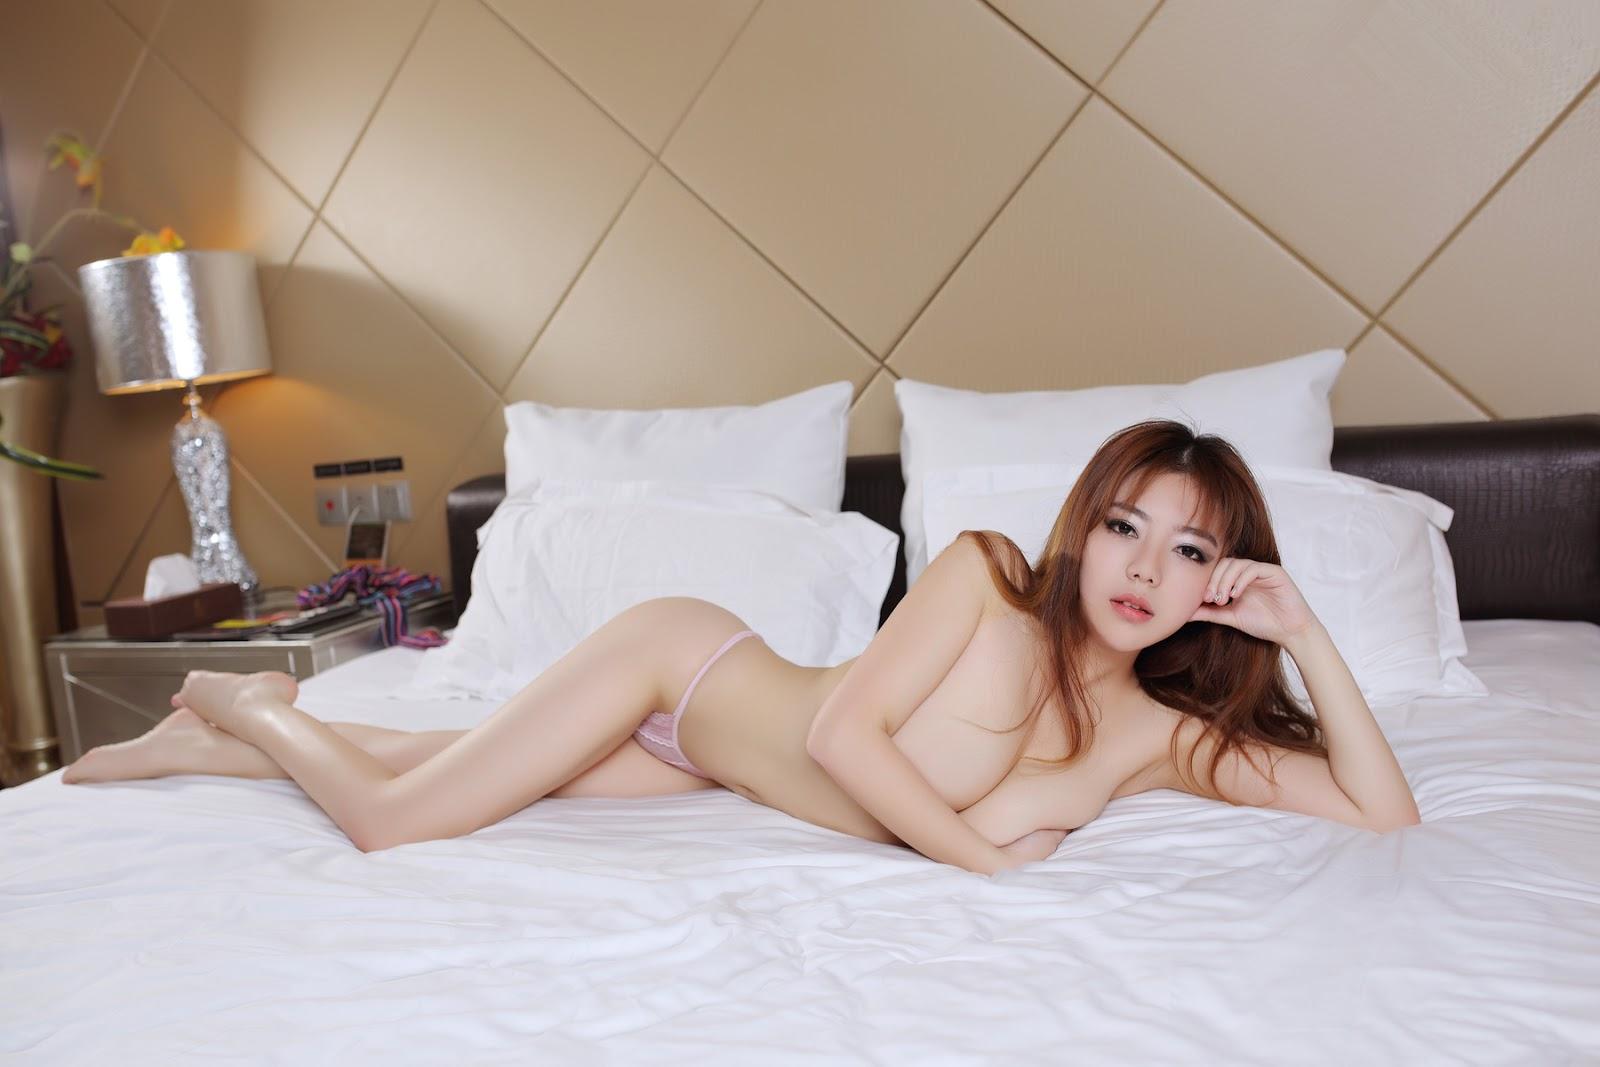 %2529%252B%252B%25C2%25A6%25C2%25B7 61 - TGOD Sexy Nude FAYE